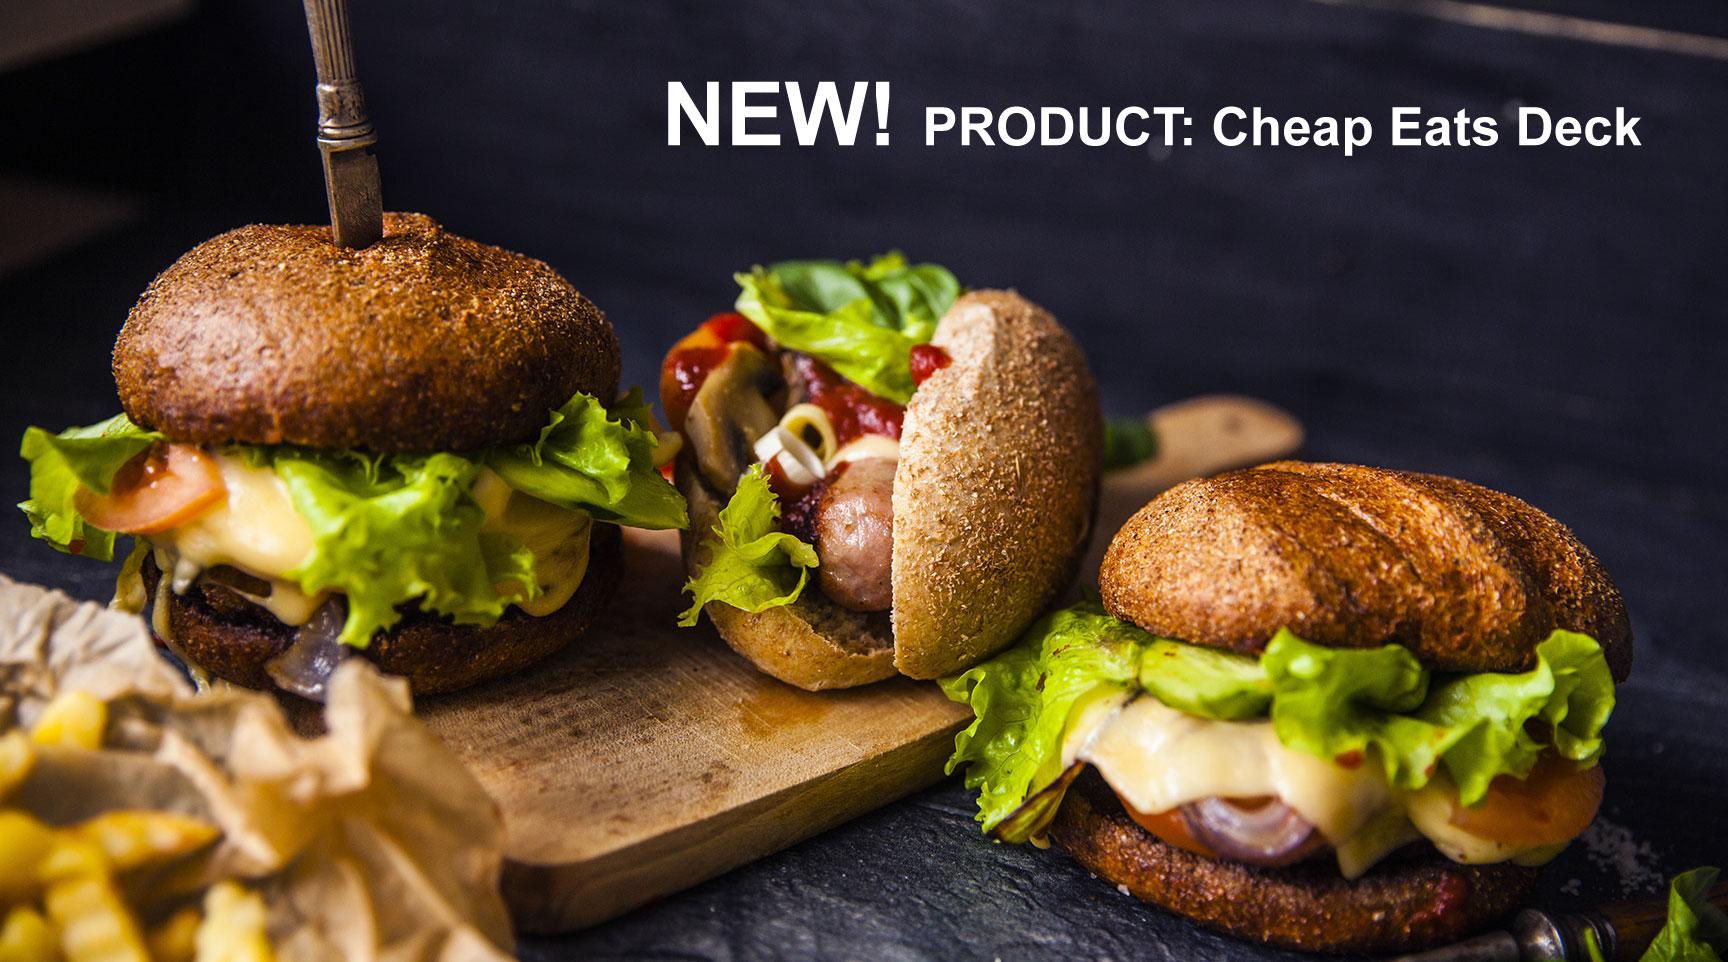 NEW! PRODUCT: Cheap Eats Deck